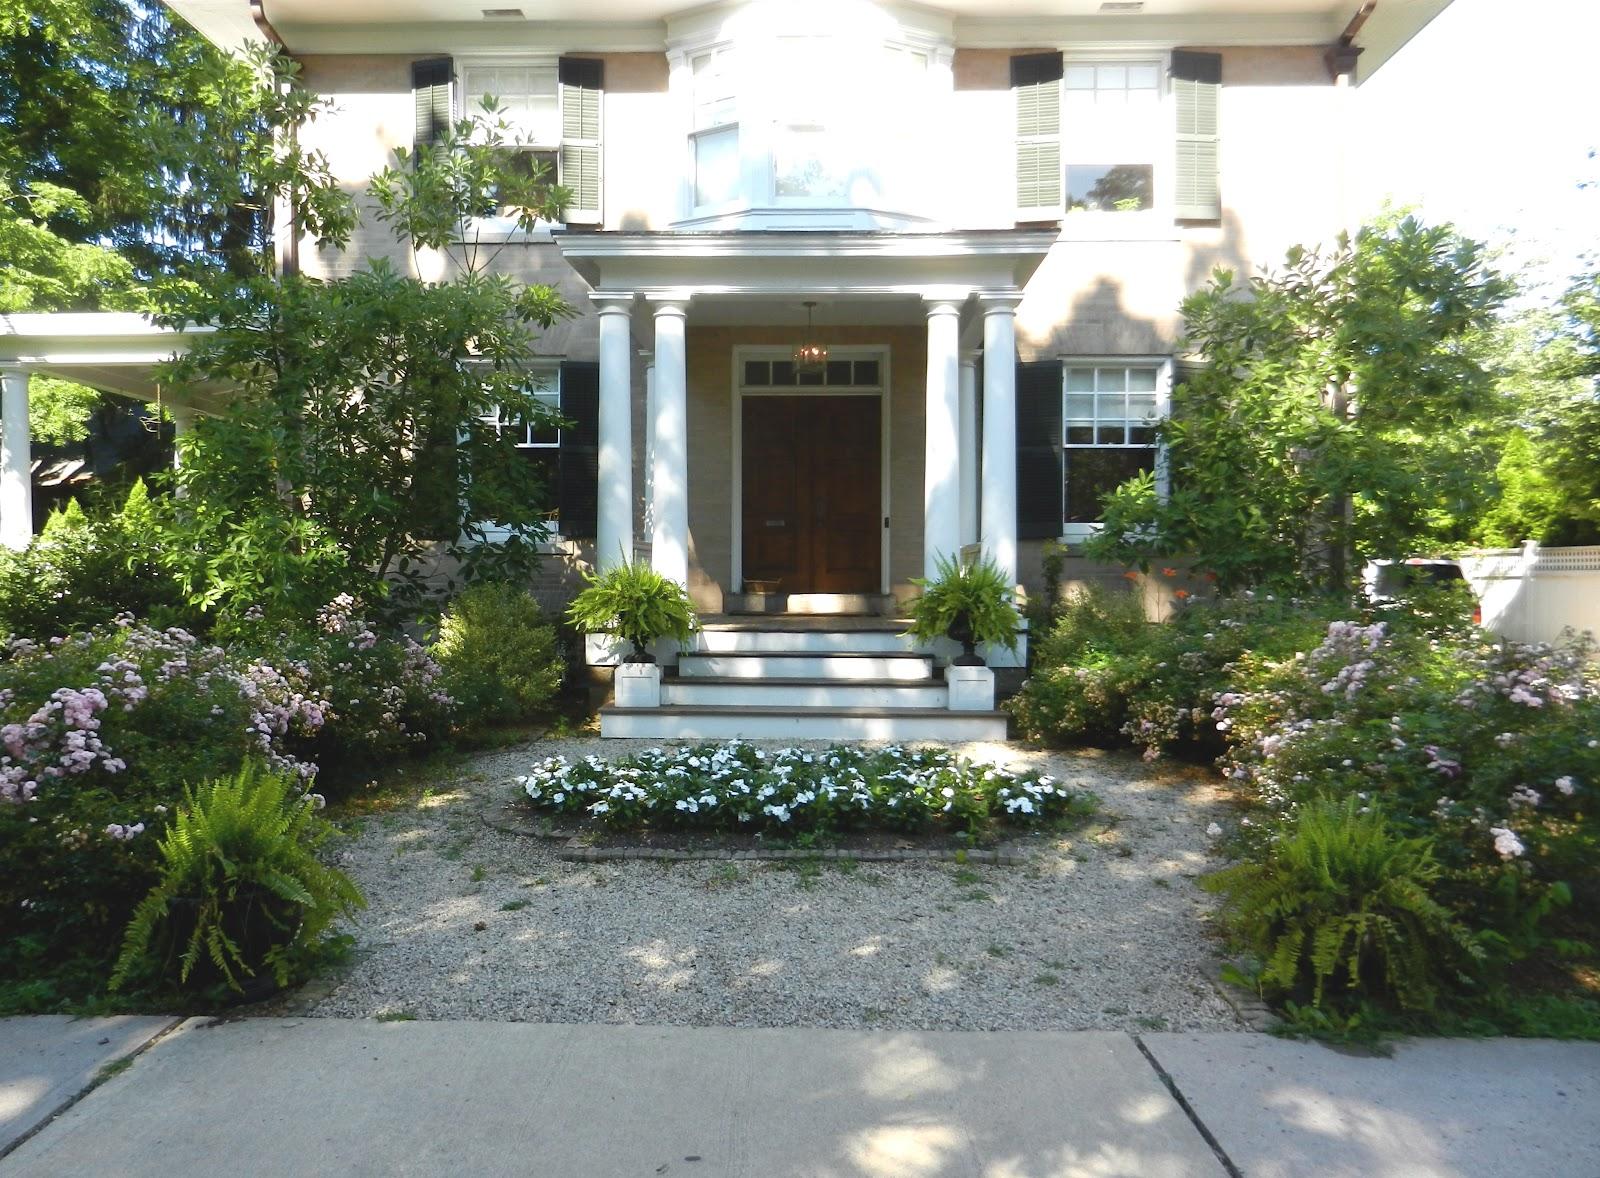 Knickerbocker Style & Design: A Garden City